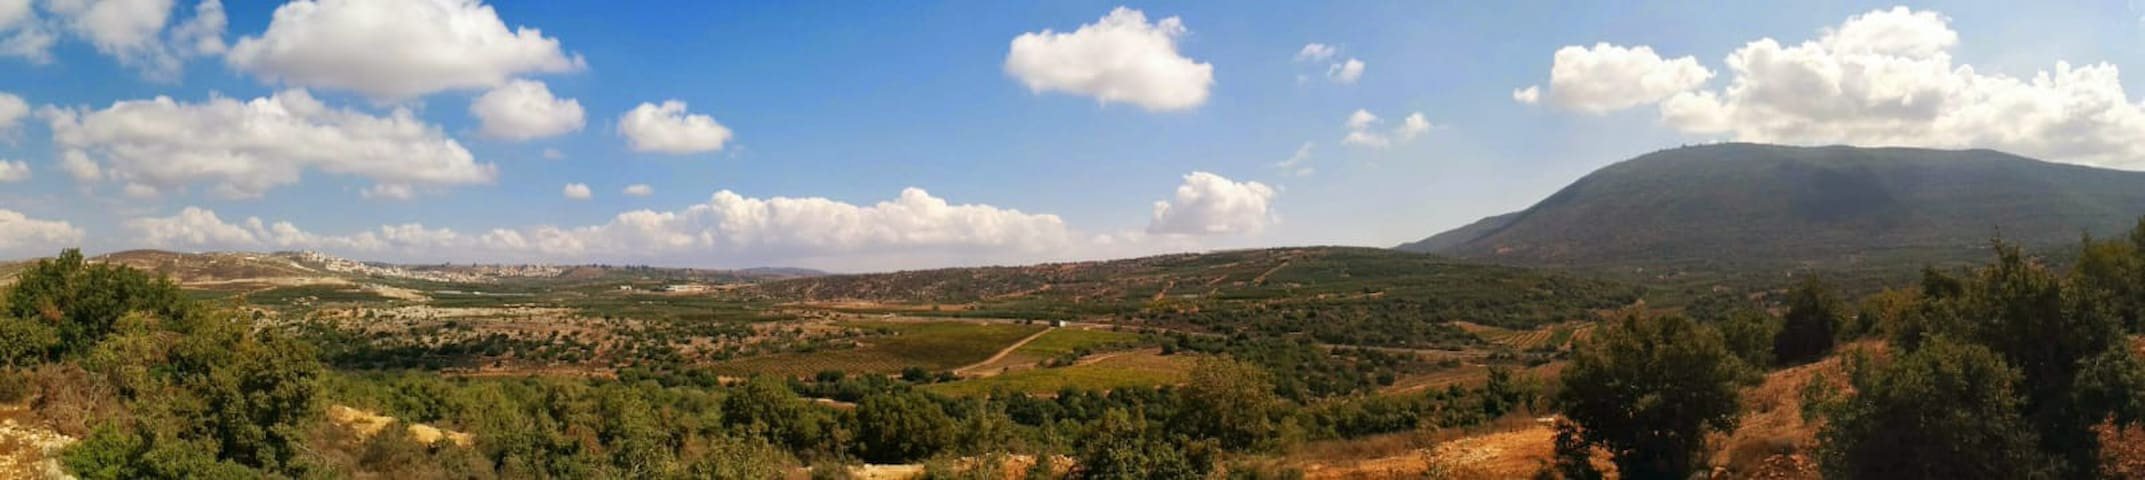 Robes- Meron View@Upper Galilee